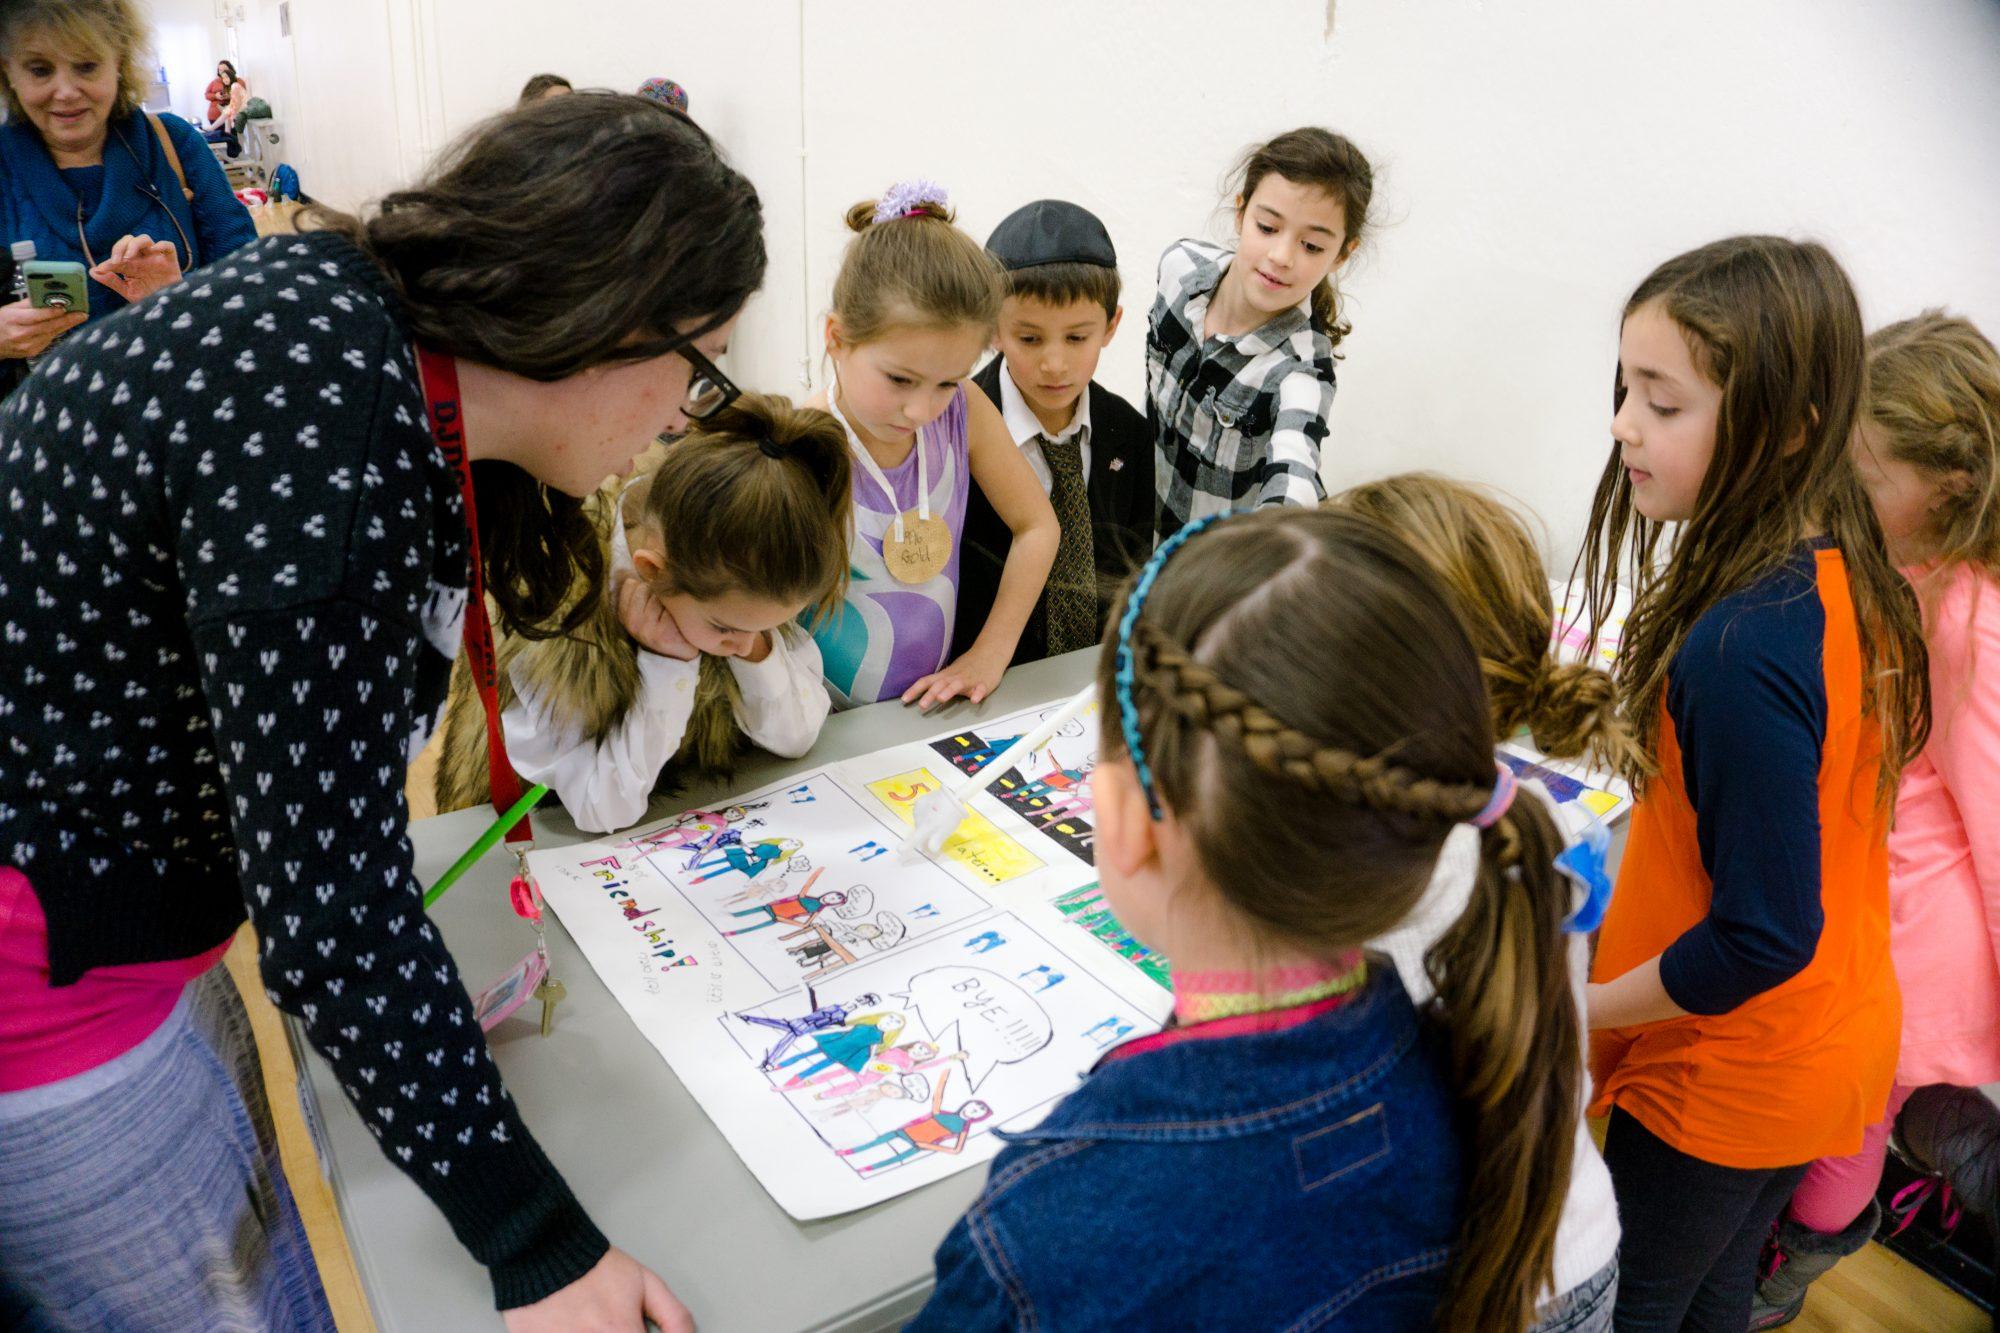 Zman Cheker – Using PBL to Unite the School Community Around Learning